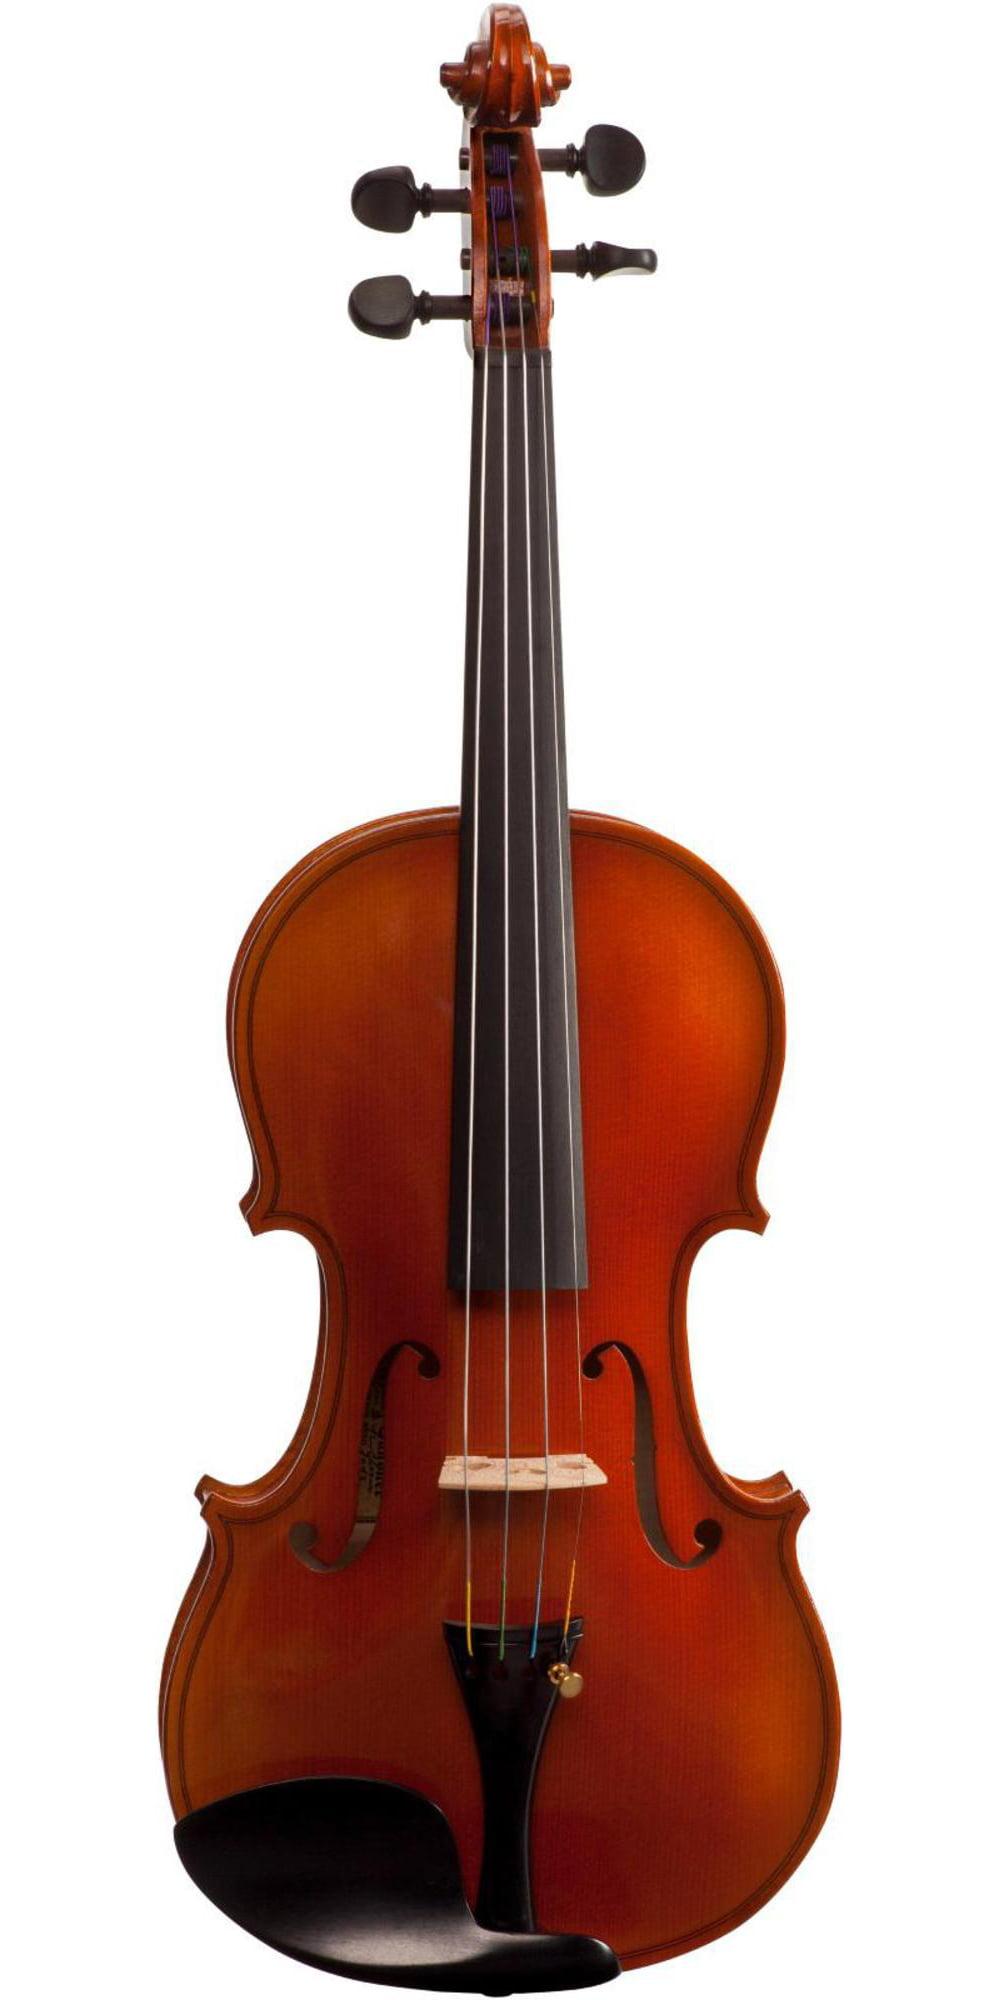 Bellafina Bavarian Series Violin Outfit 4 4 Size by Bellafina